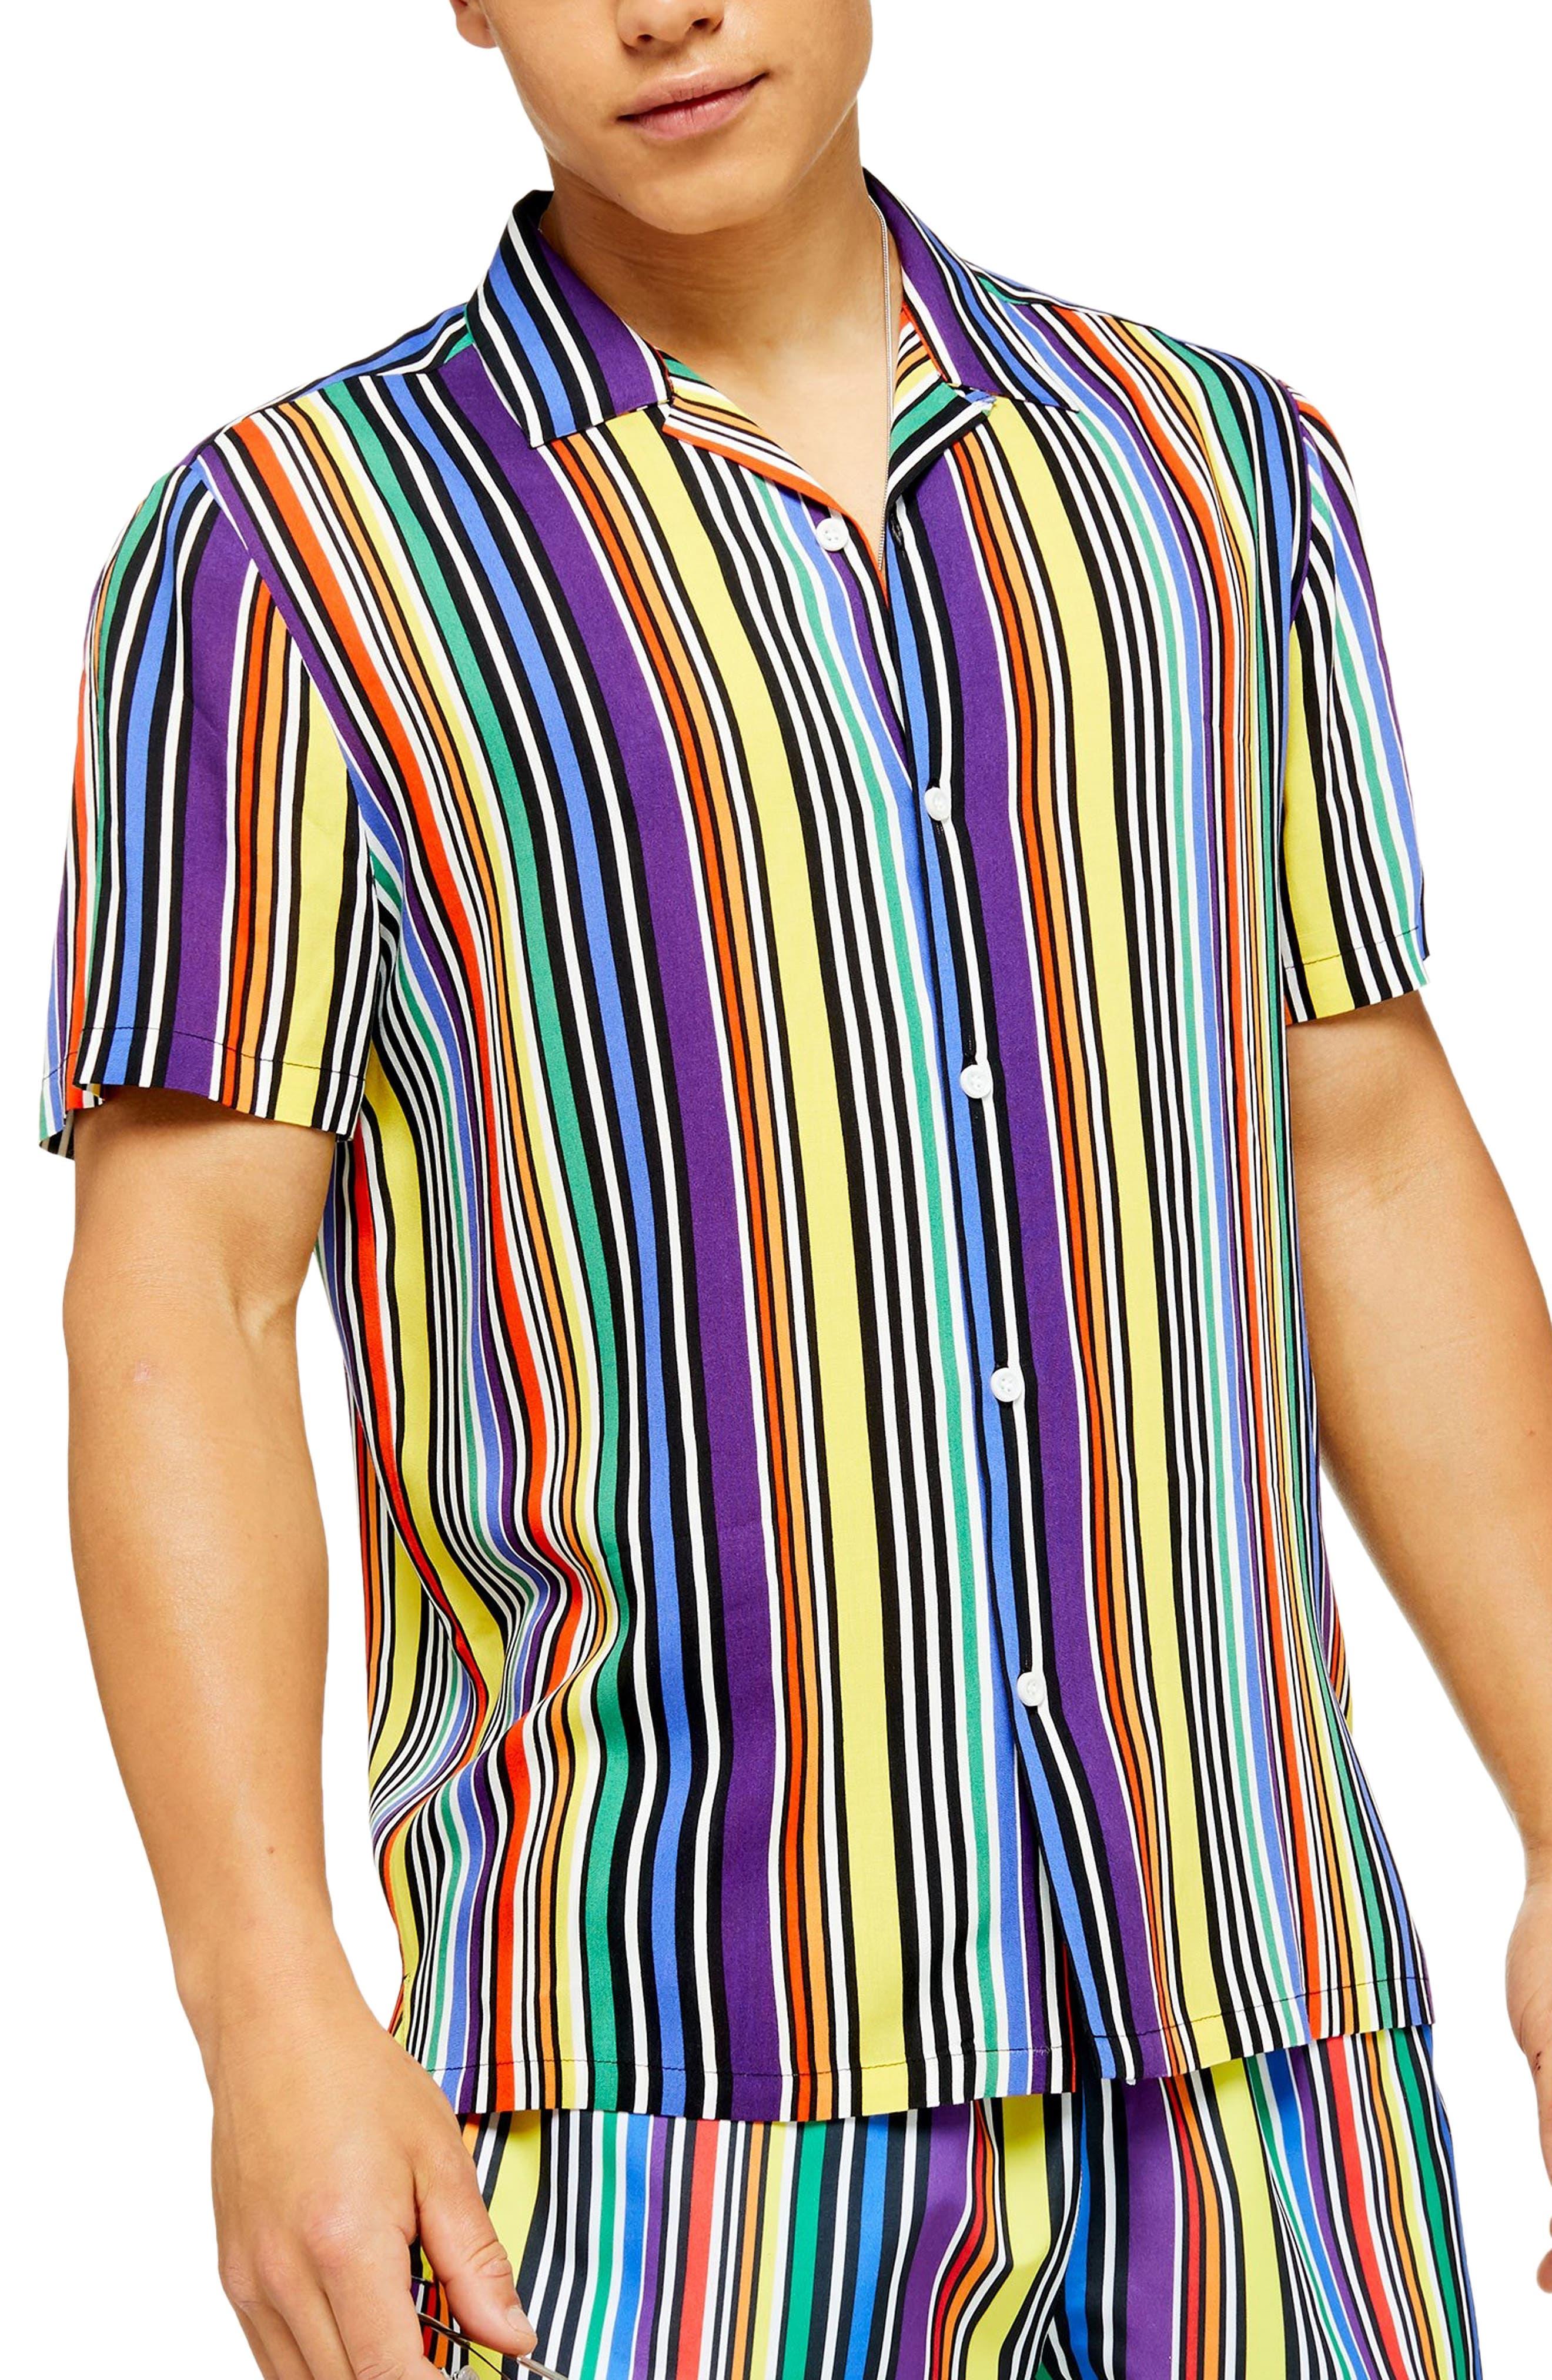 1960s – 70s Mens Shirts- Disco Shirts, Hippie Shirts Mens Topman Regular Fit Stripe Short Sleeve Button-Up Camp Shirt Size X-Small - Yellow $26.90 AT vintagedancer.com